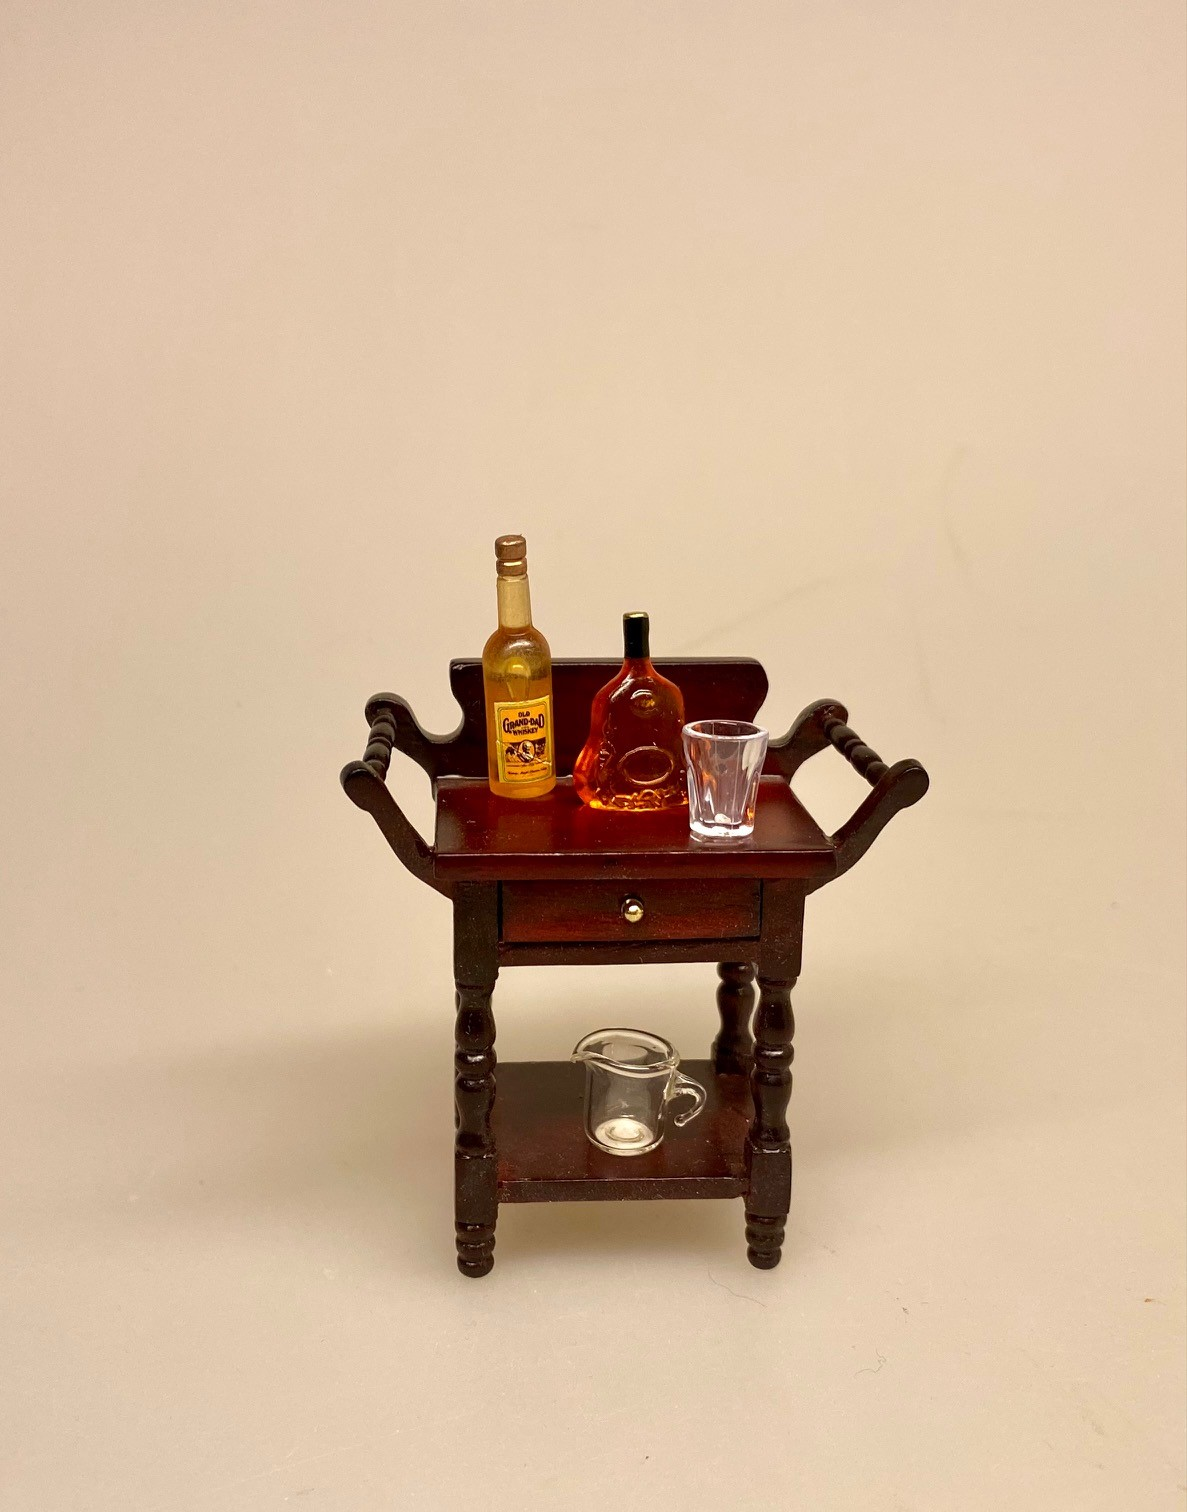 Miniature Flaske med V.S.O.P. Cognac, minibar, mini, miniature, flasker, hjemmebar, gavekort, spiritus, sangskjuler, sjov, gavekort, symbolsk, dukkehus, dukkehusting, dukkehustilbehør, sætterkasse, sættekasse, ting til, tilbehør, nisser, nissedør, nissebo, biti, ribe